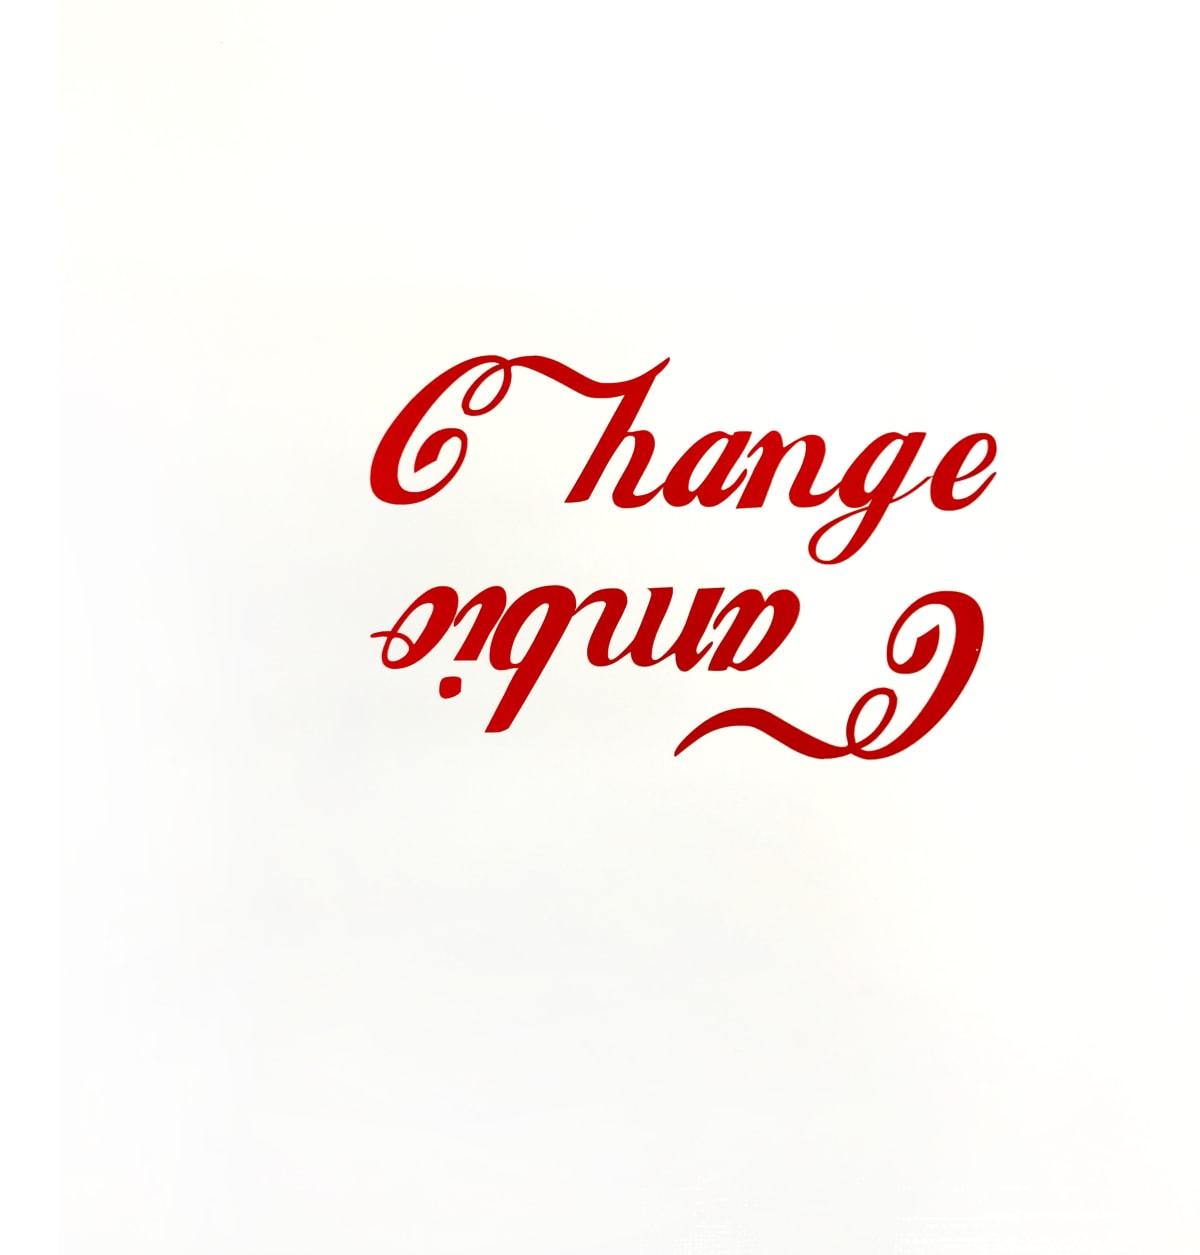 Artwork Image: Ethel Shipton, Change Cambio, 2020, House paint, vinyl on panel, 24 × 24 in 61 × 61 cm